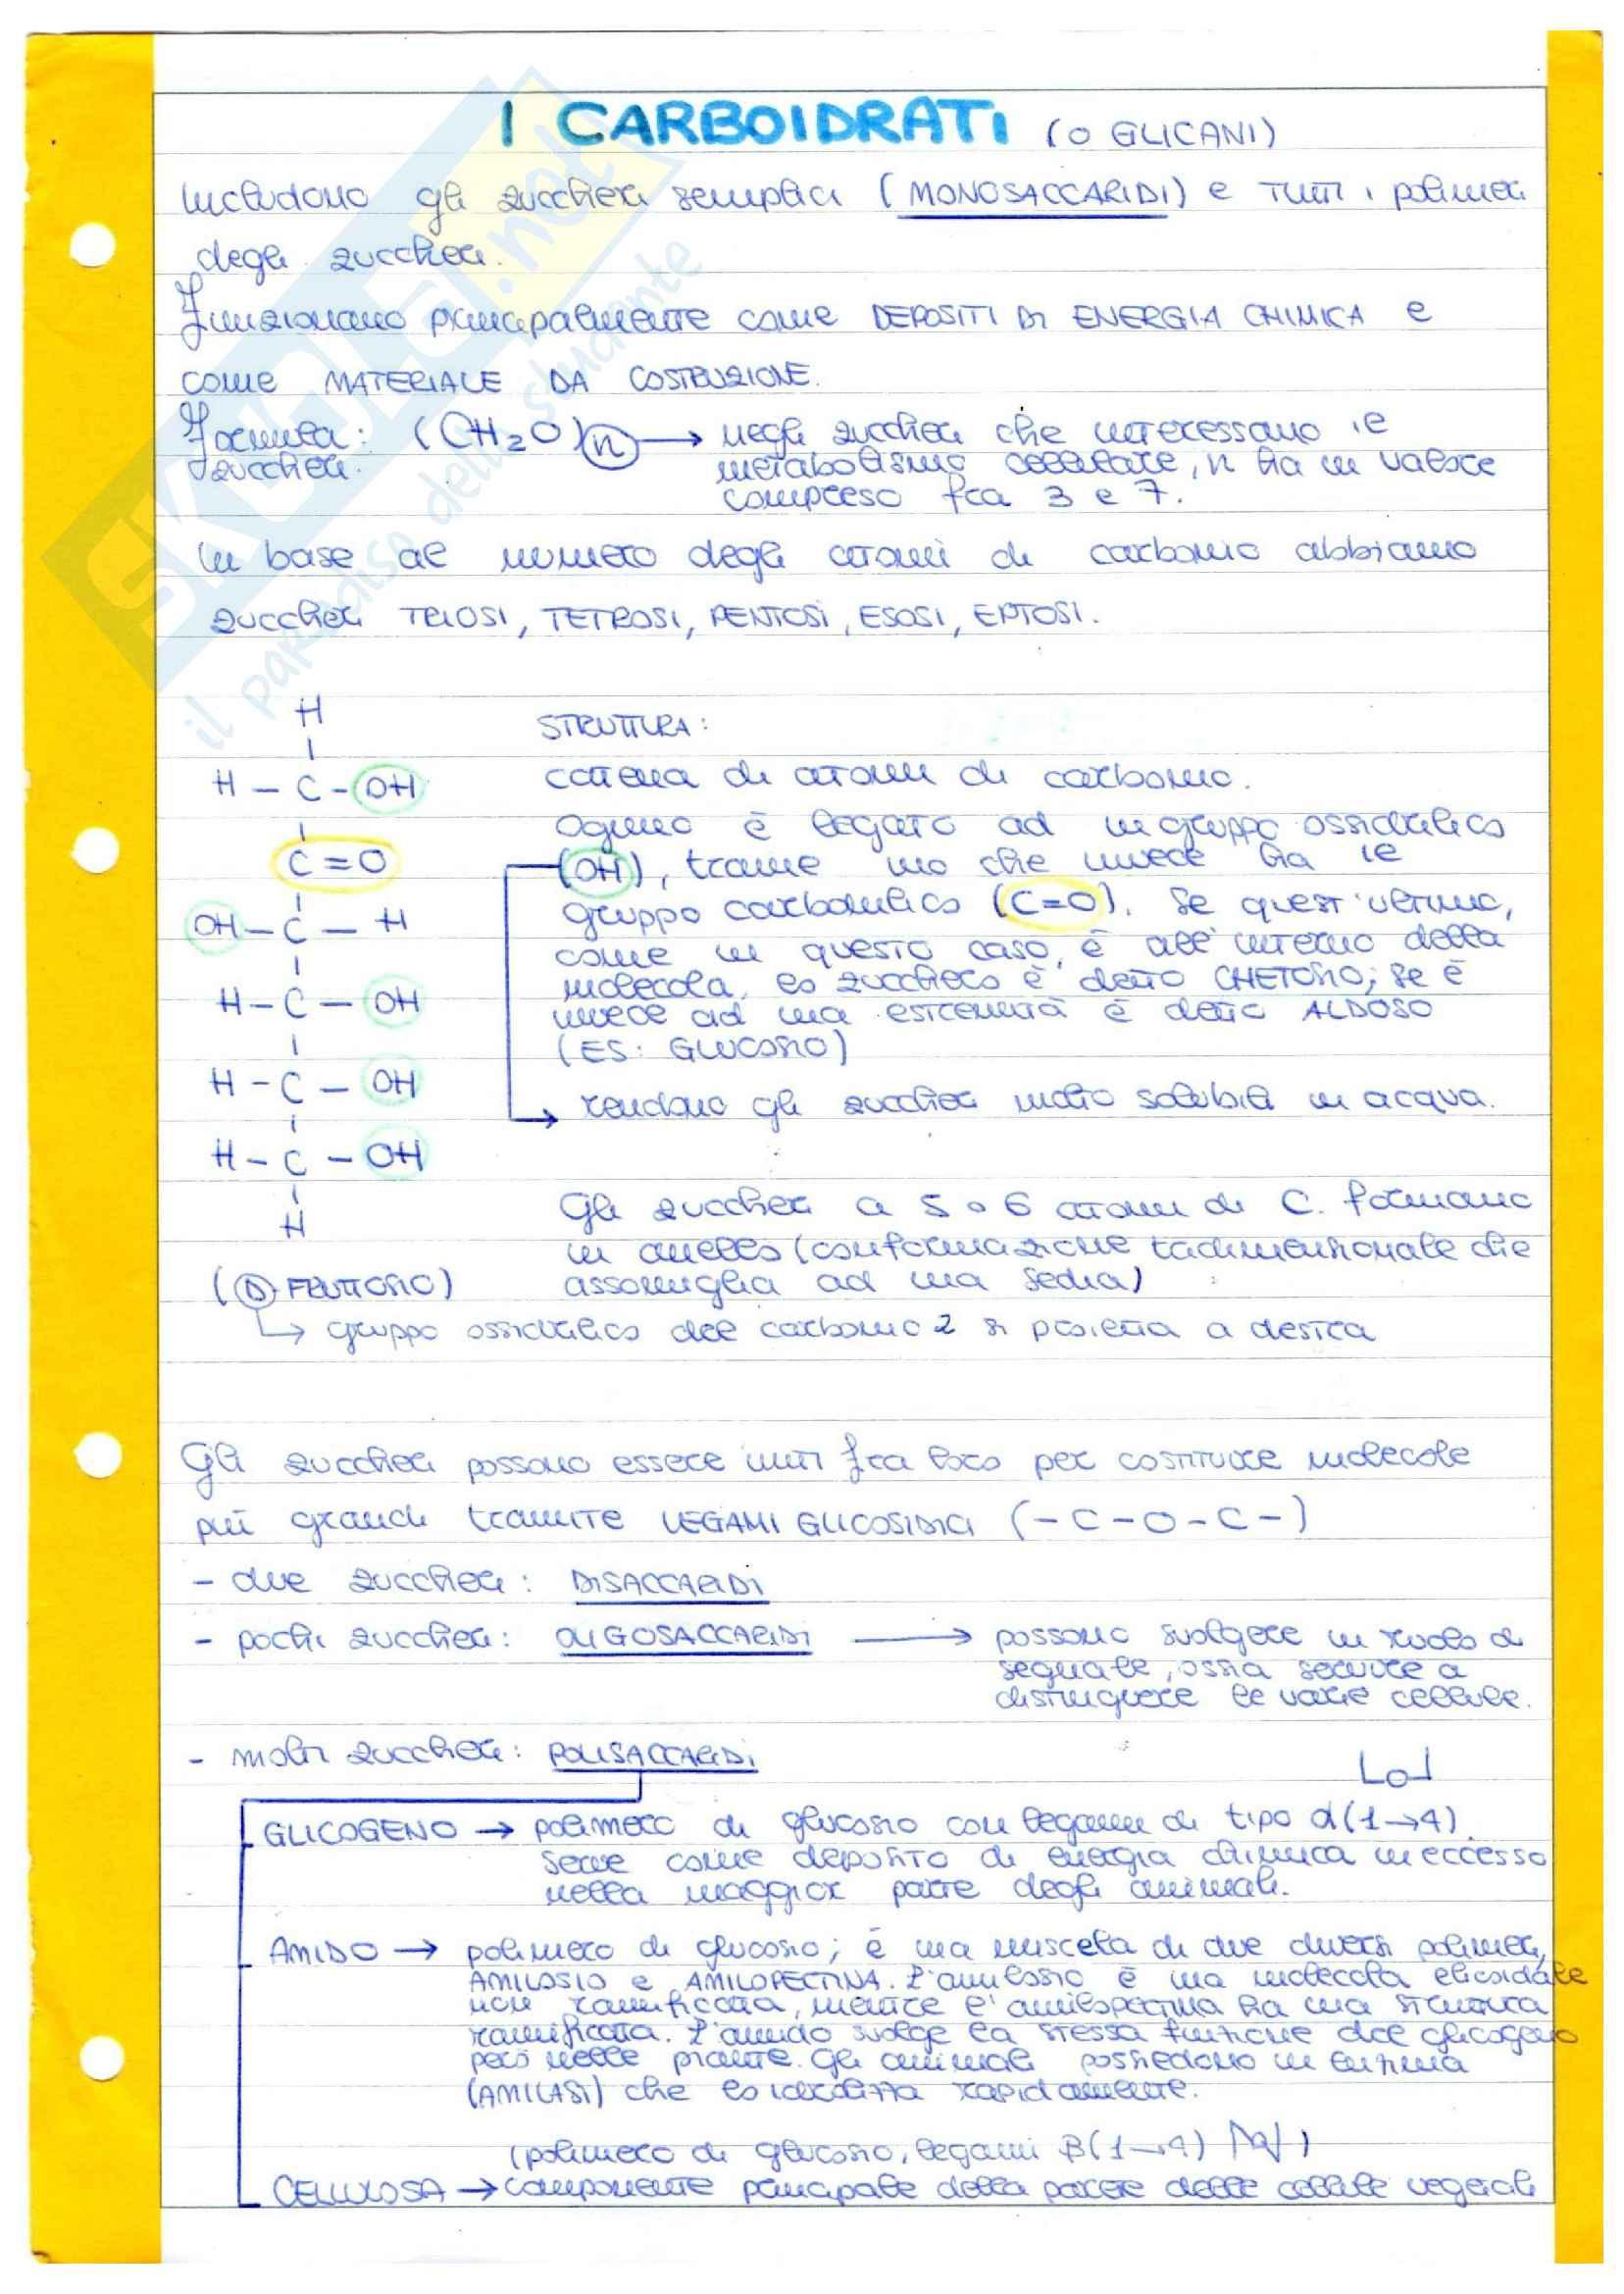 Molecole biologiche - DNA - duplicazione - trascrizione - traduzione